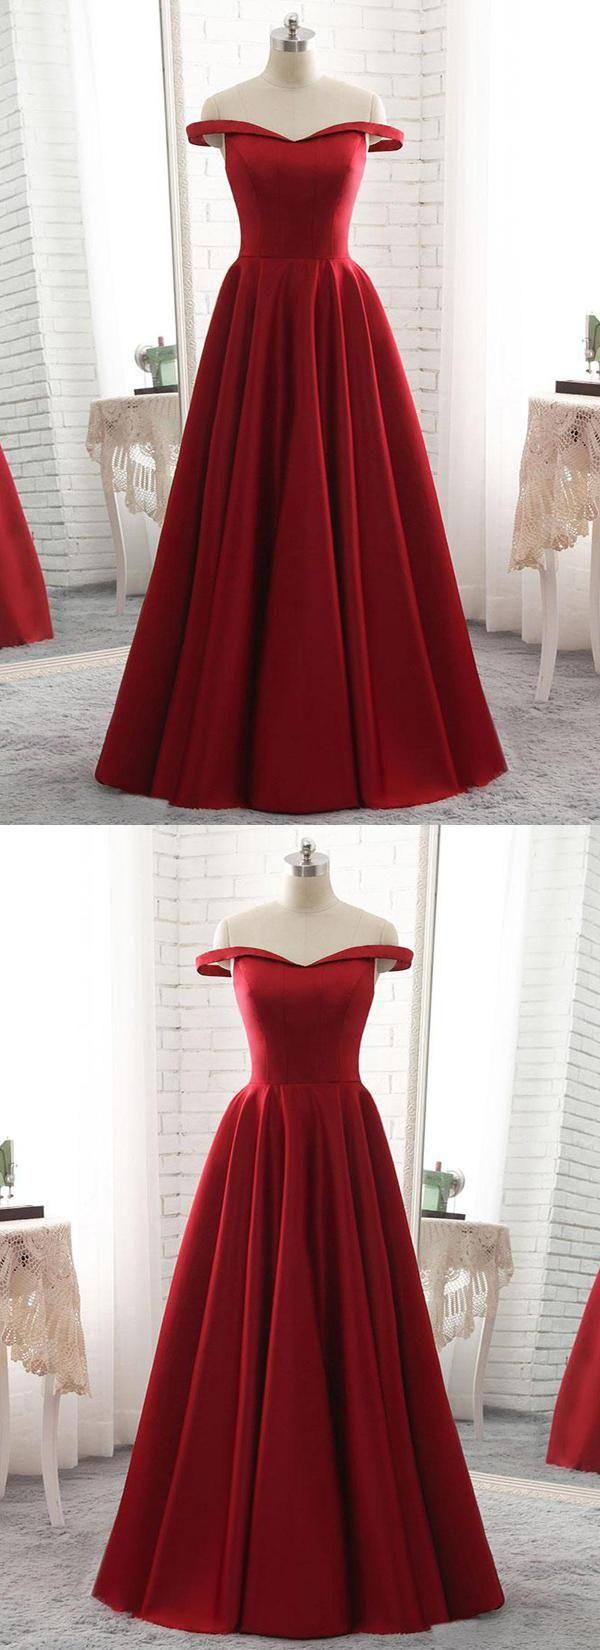 Fetching burgundy vneck prom dresses long pinterest dresses